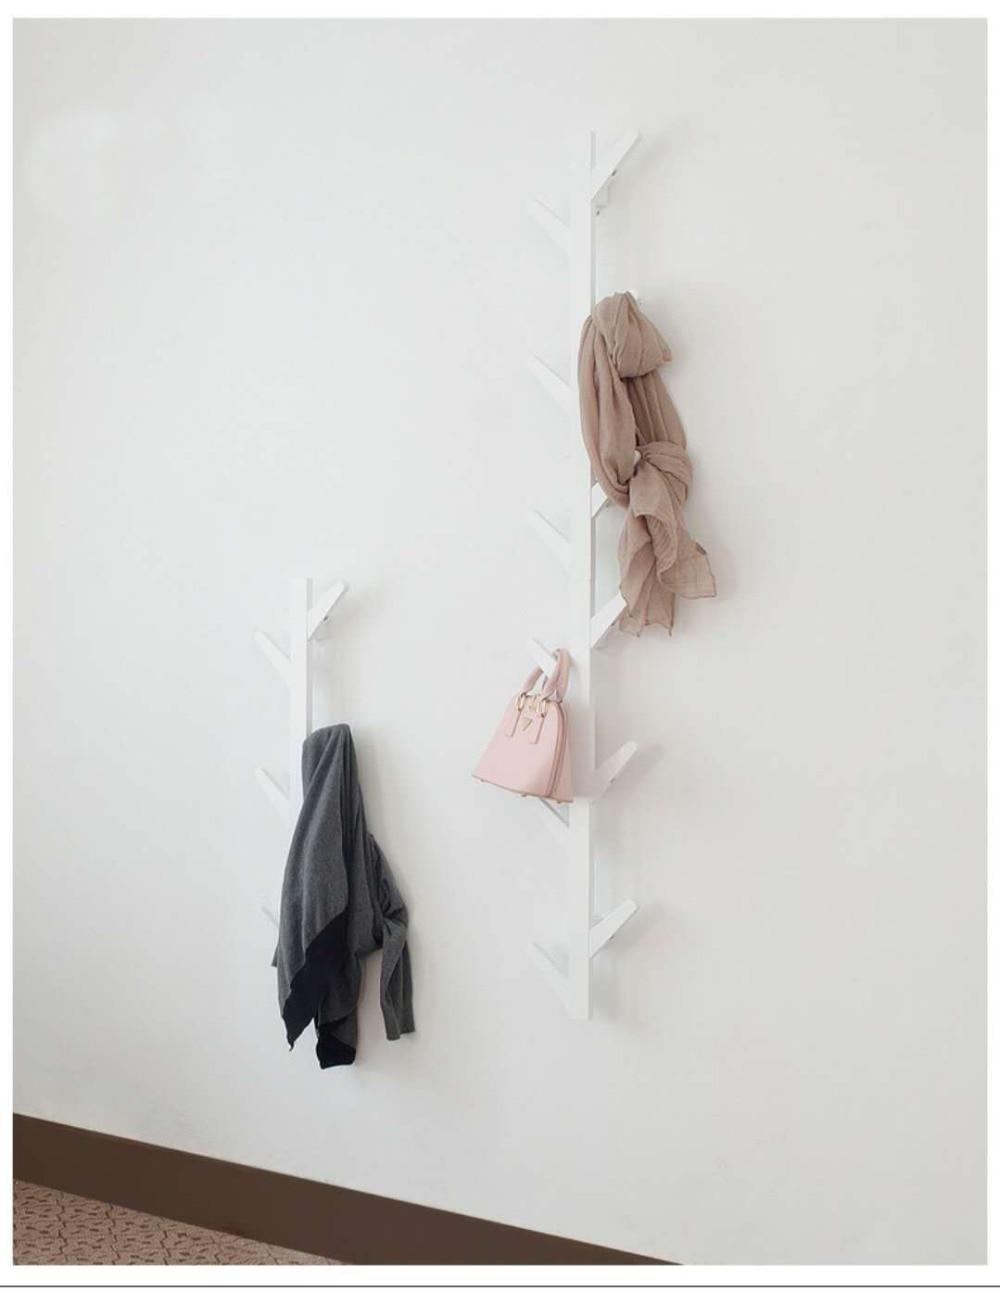 Äste, wand kleiderbügel, veranda, dekoration, kleidung rack, wand dekoration. C - 6